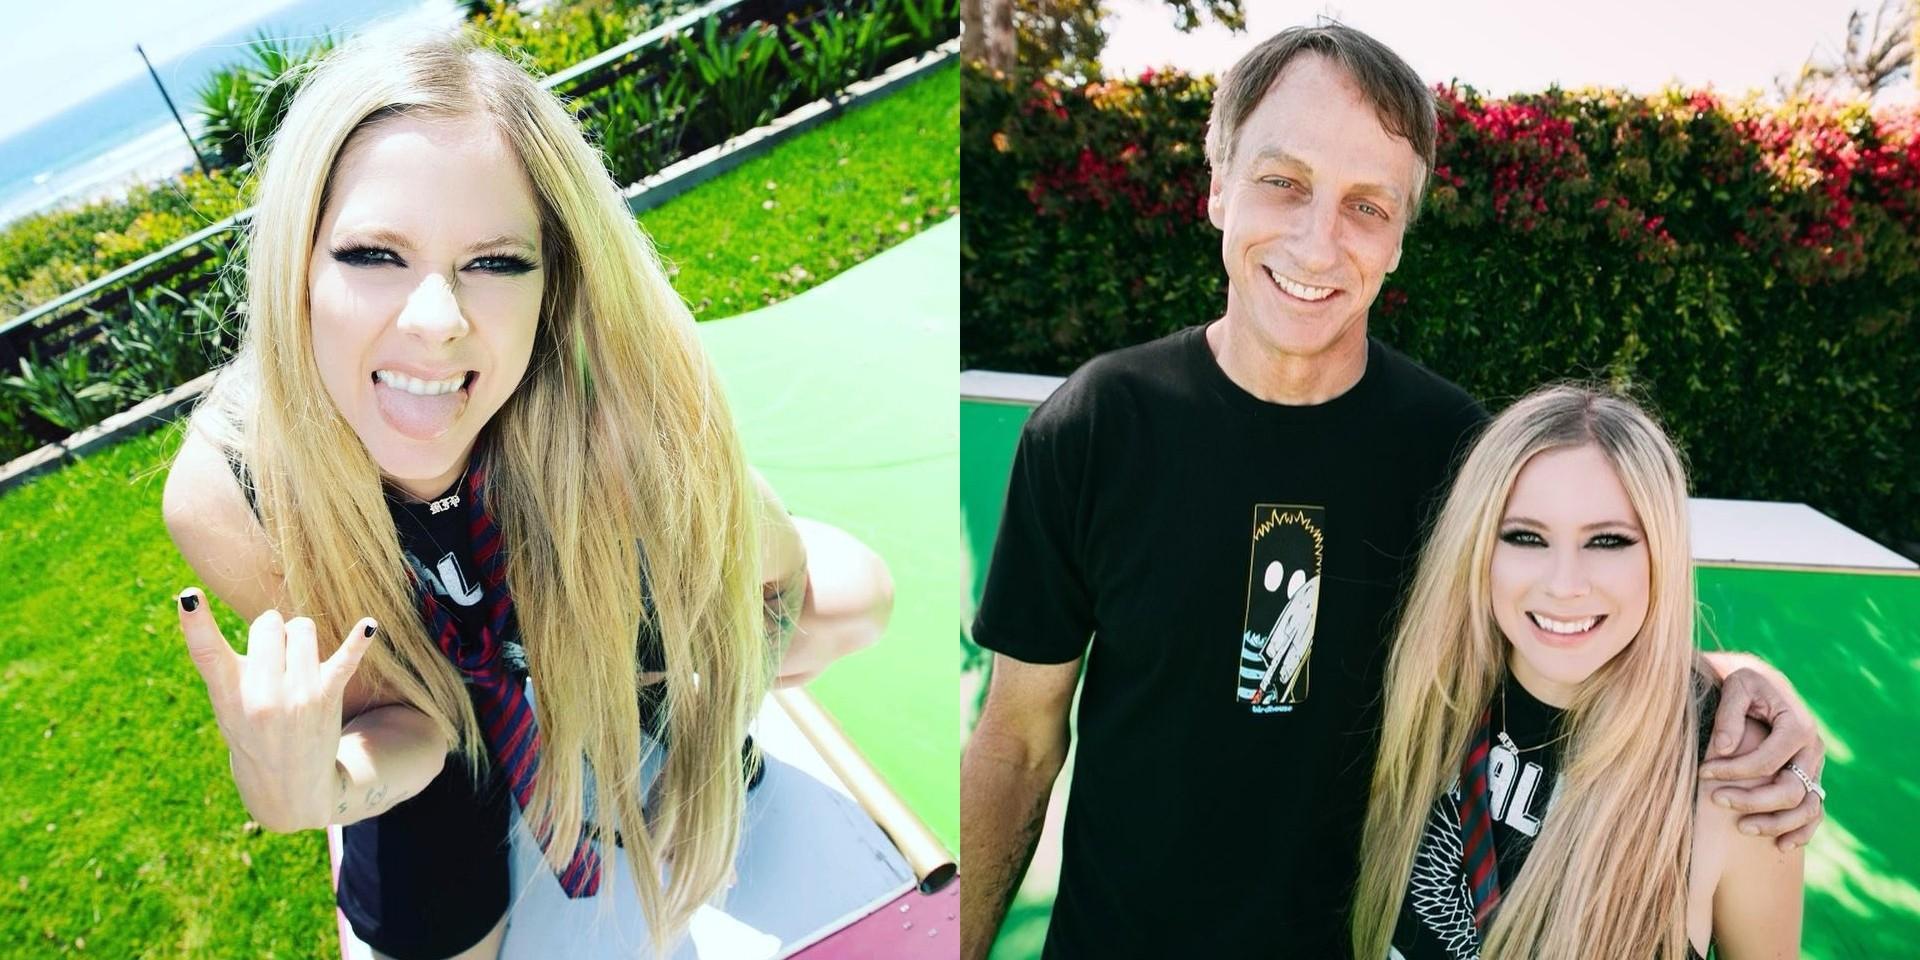 Avril Lavigne teams up with Tony Hawk for 'Sk8er Boi' TikTok debut – watch